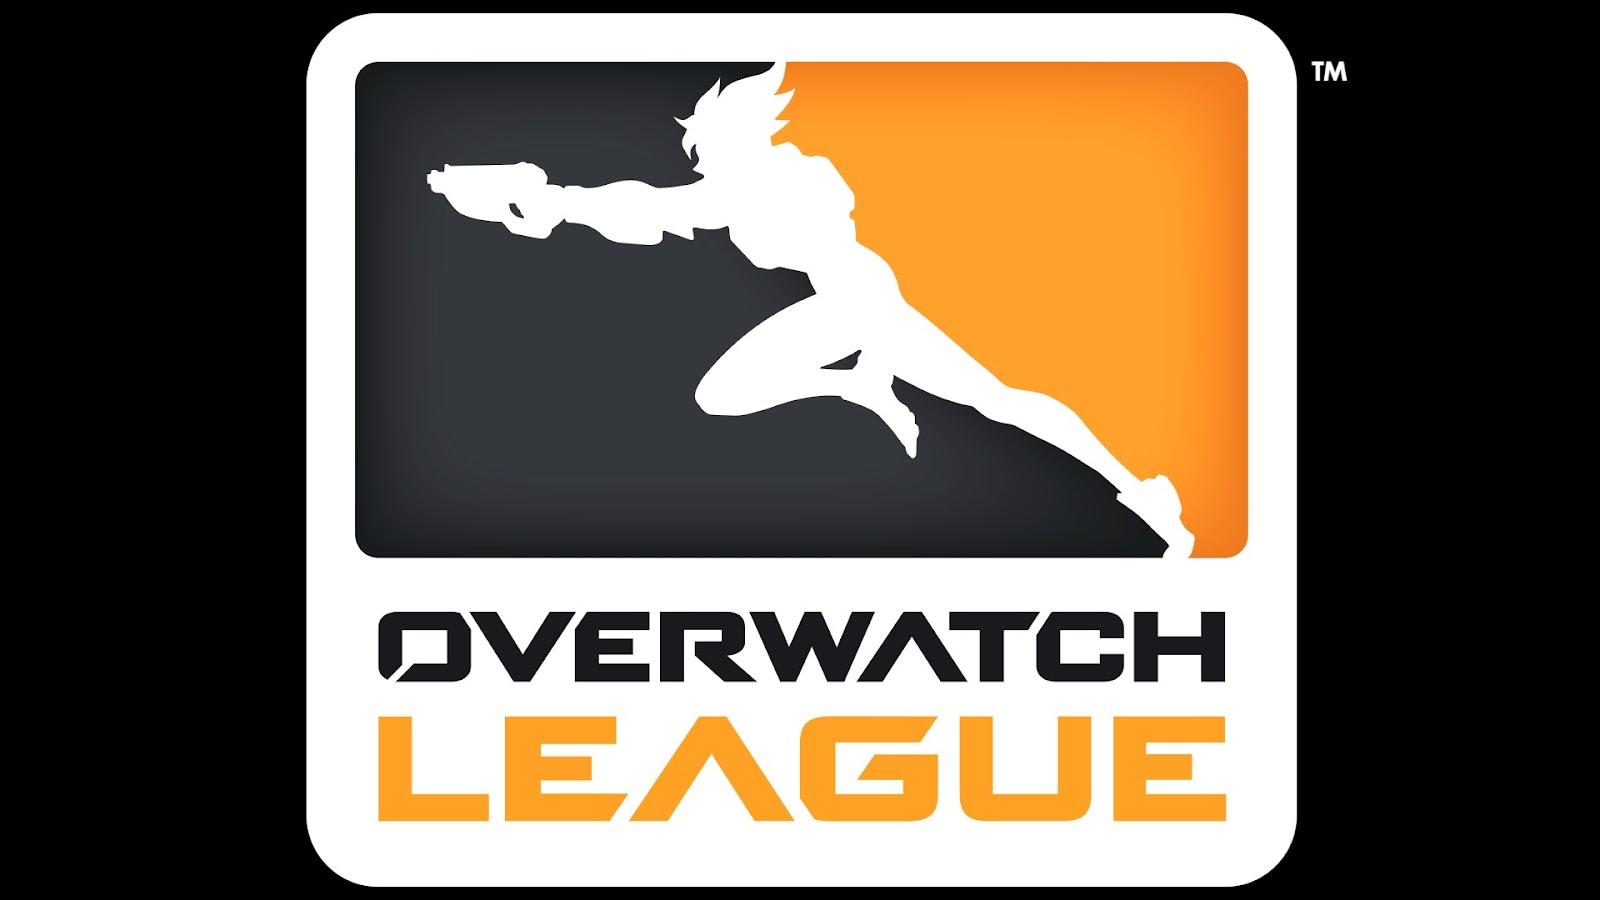 OW_League_Logo_Lockup_dark_bkg_png_jpgcopy.jpg